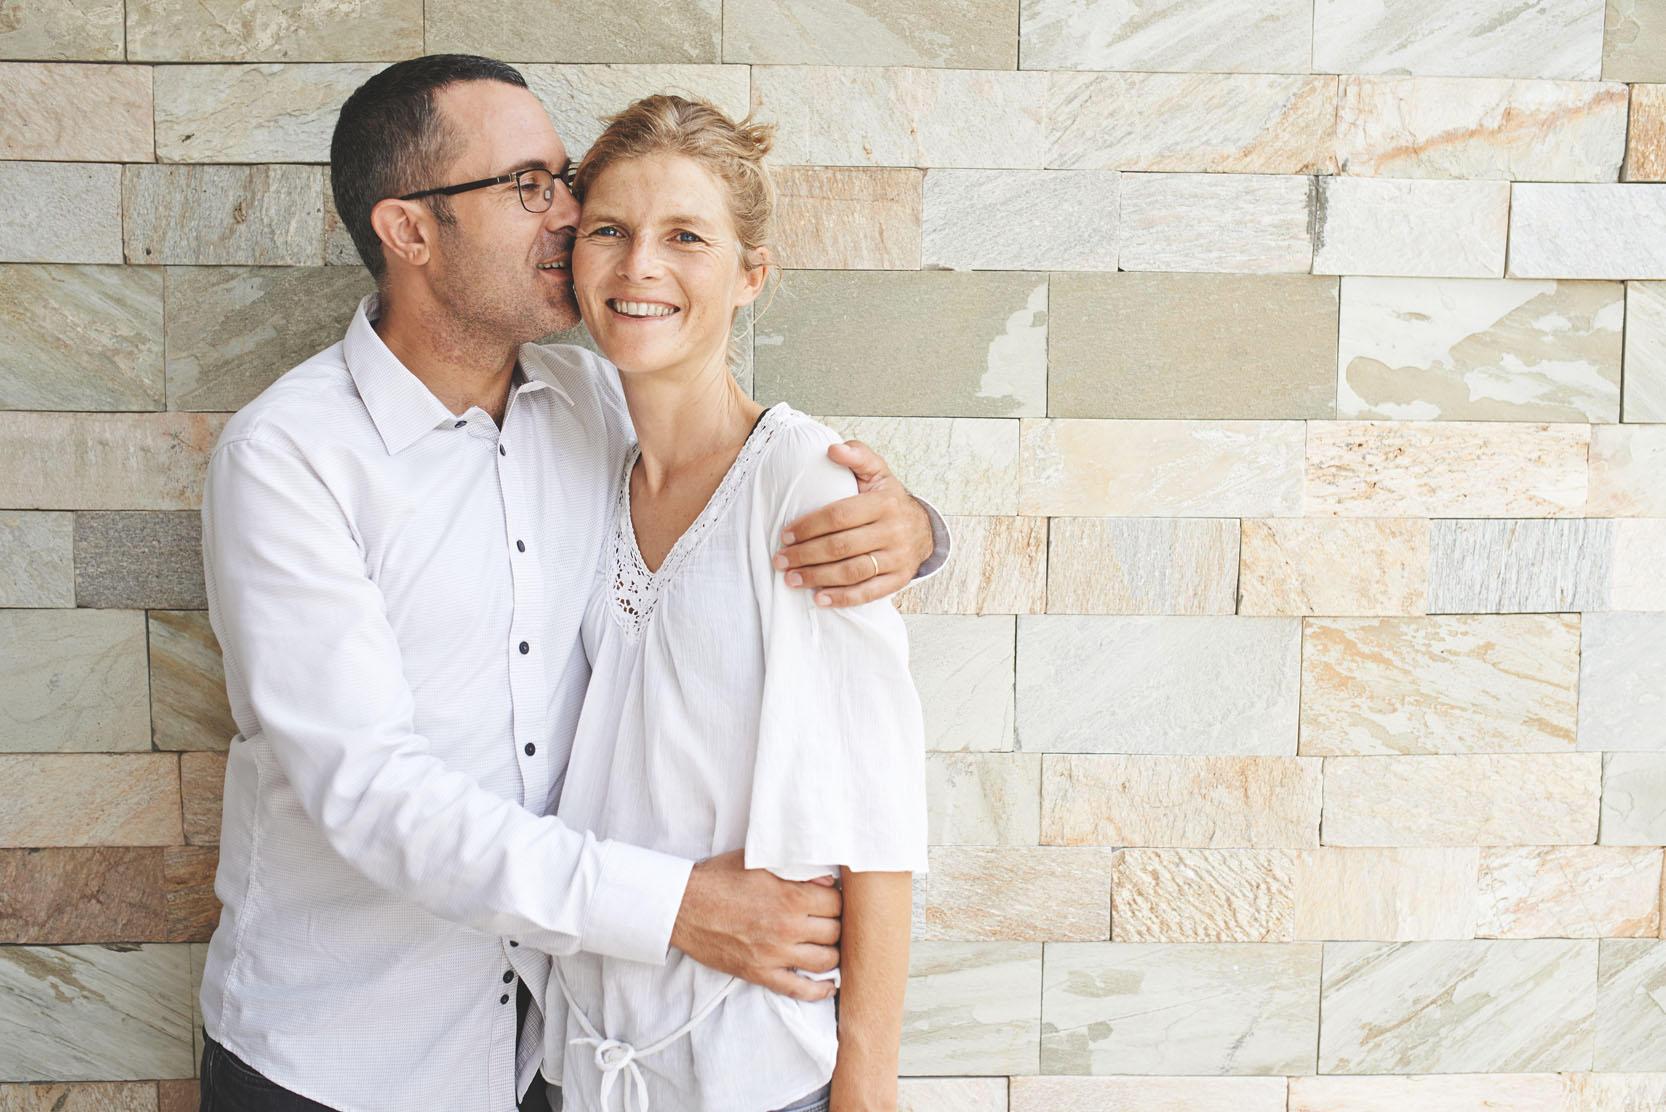 Dating entfremdet Ehemannusa mobile Dating-Seite